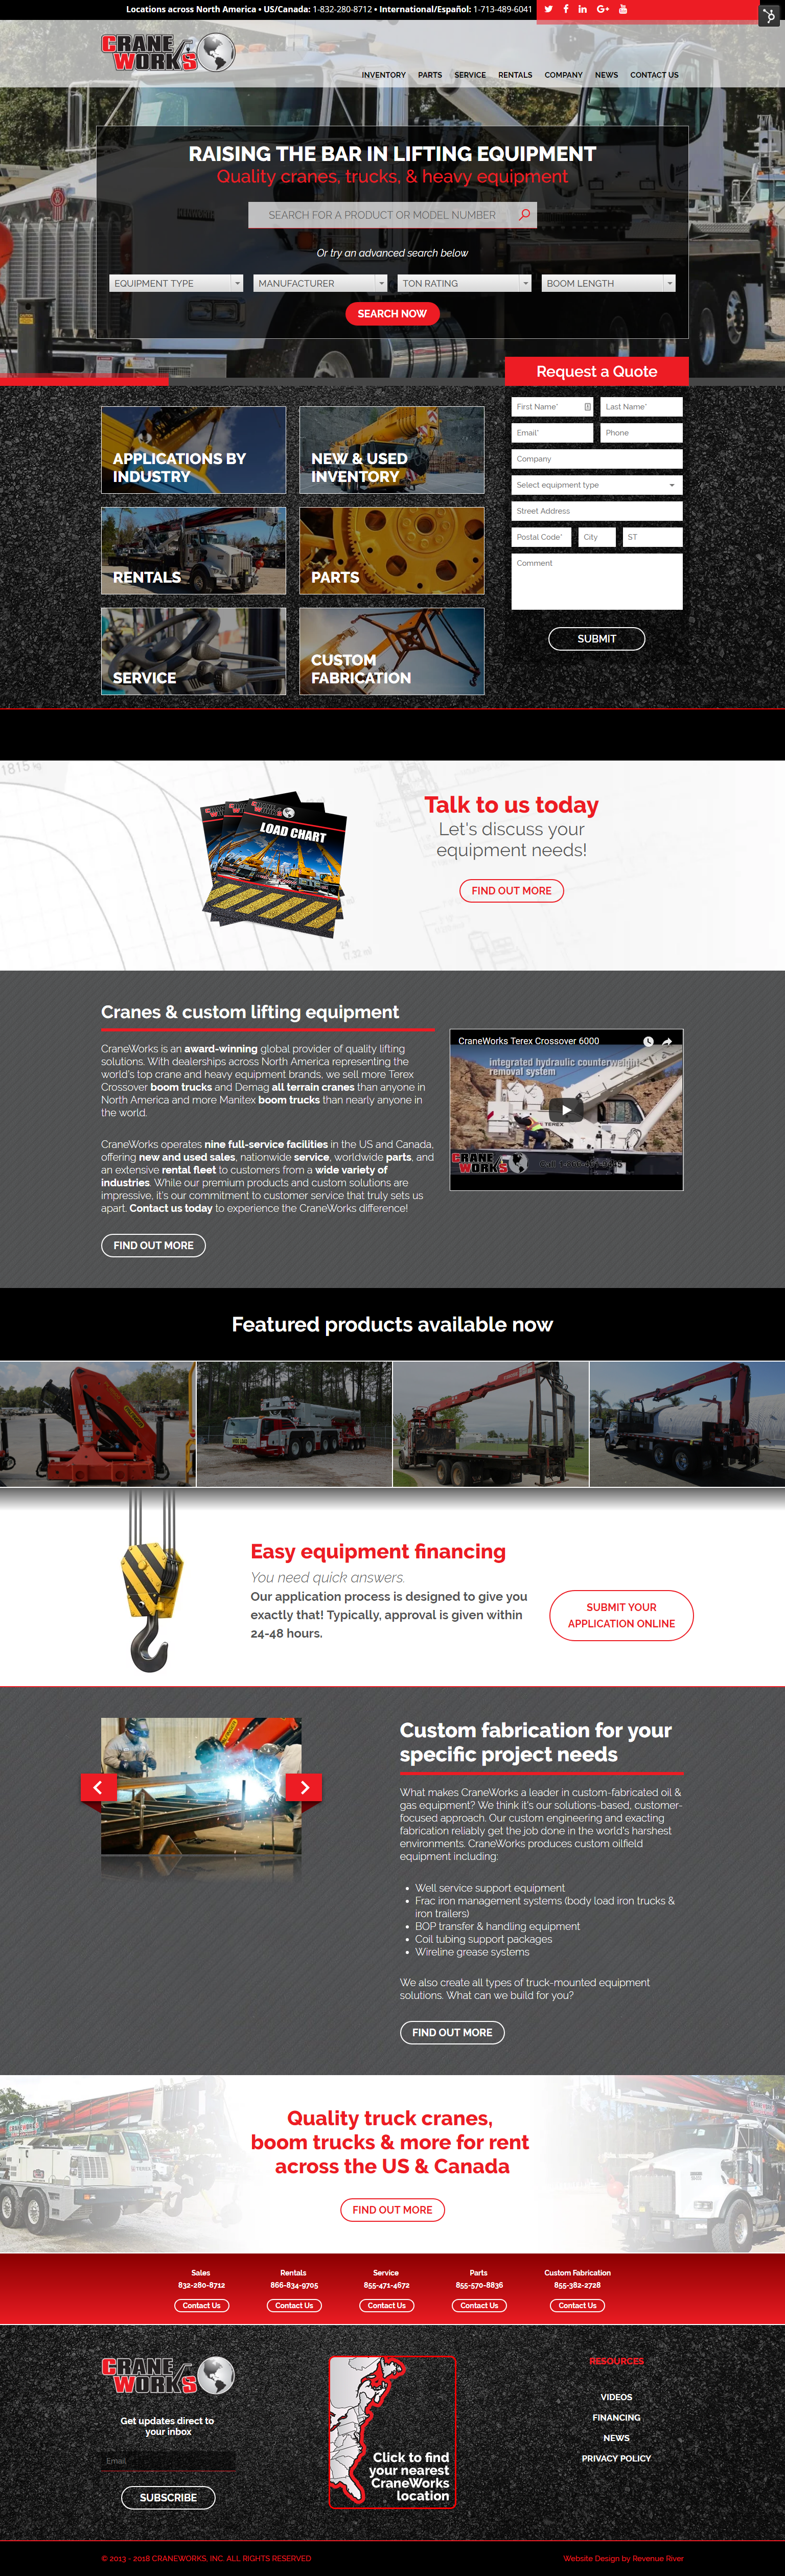 CraneWorks new homepage